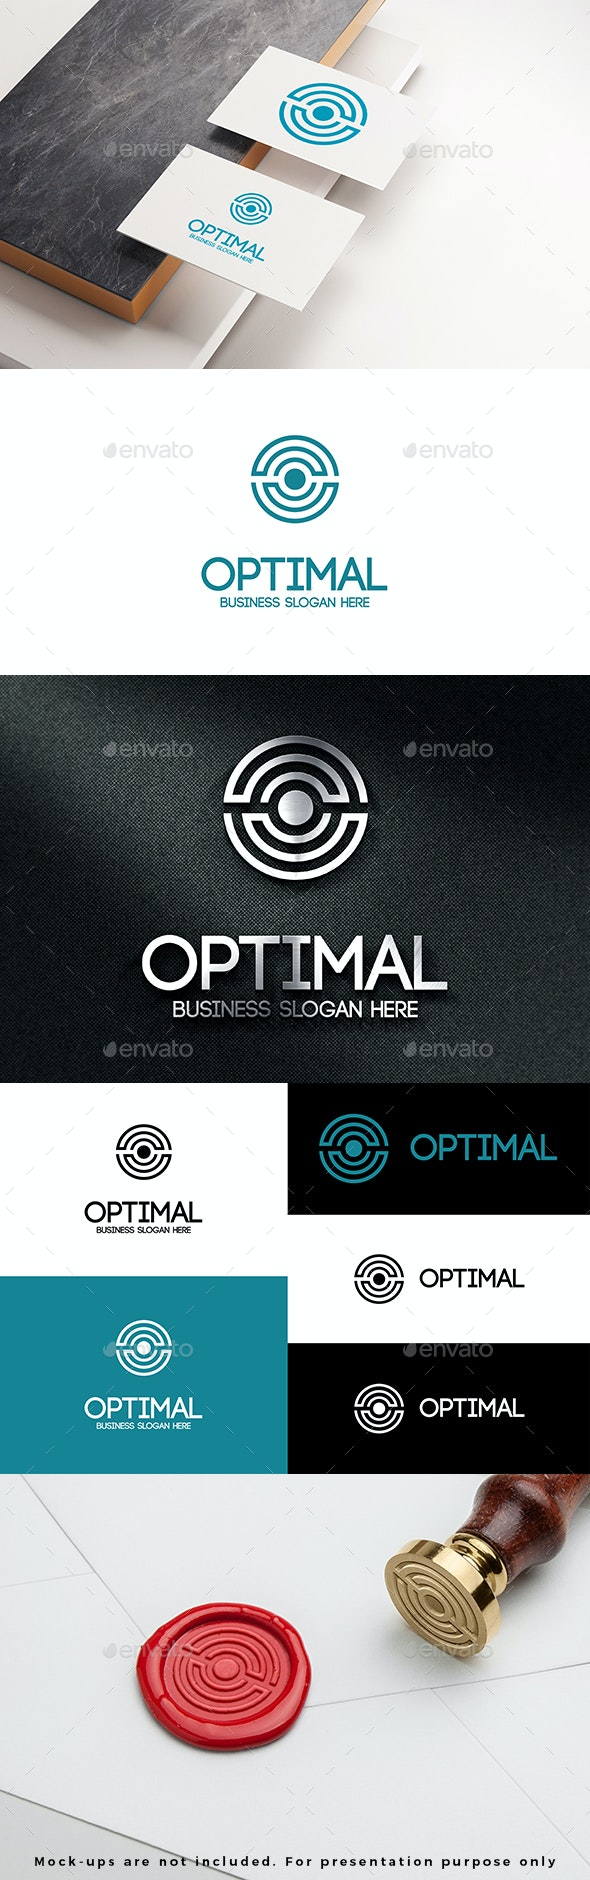 Optimal Circle Abstract O Logo Letter - Abstract Logo Templates